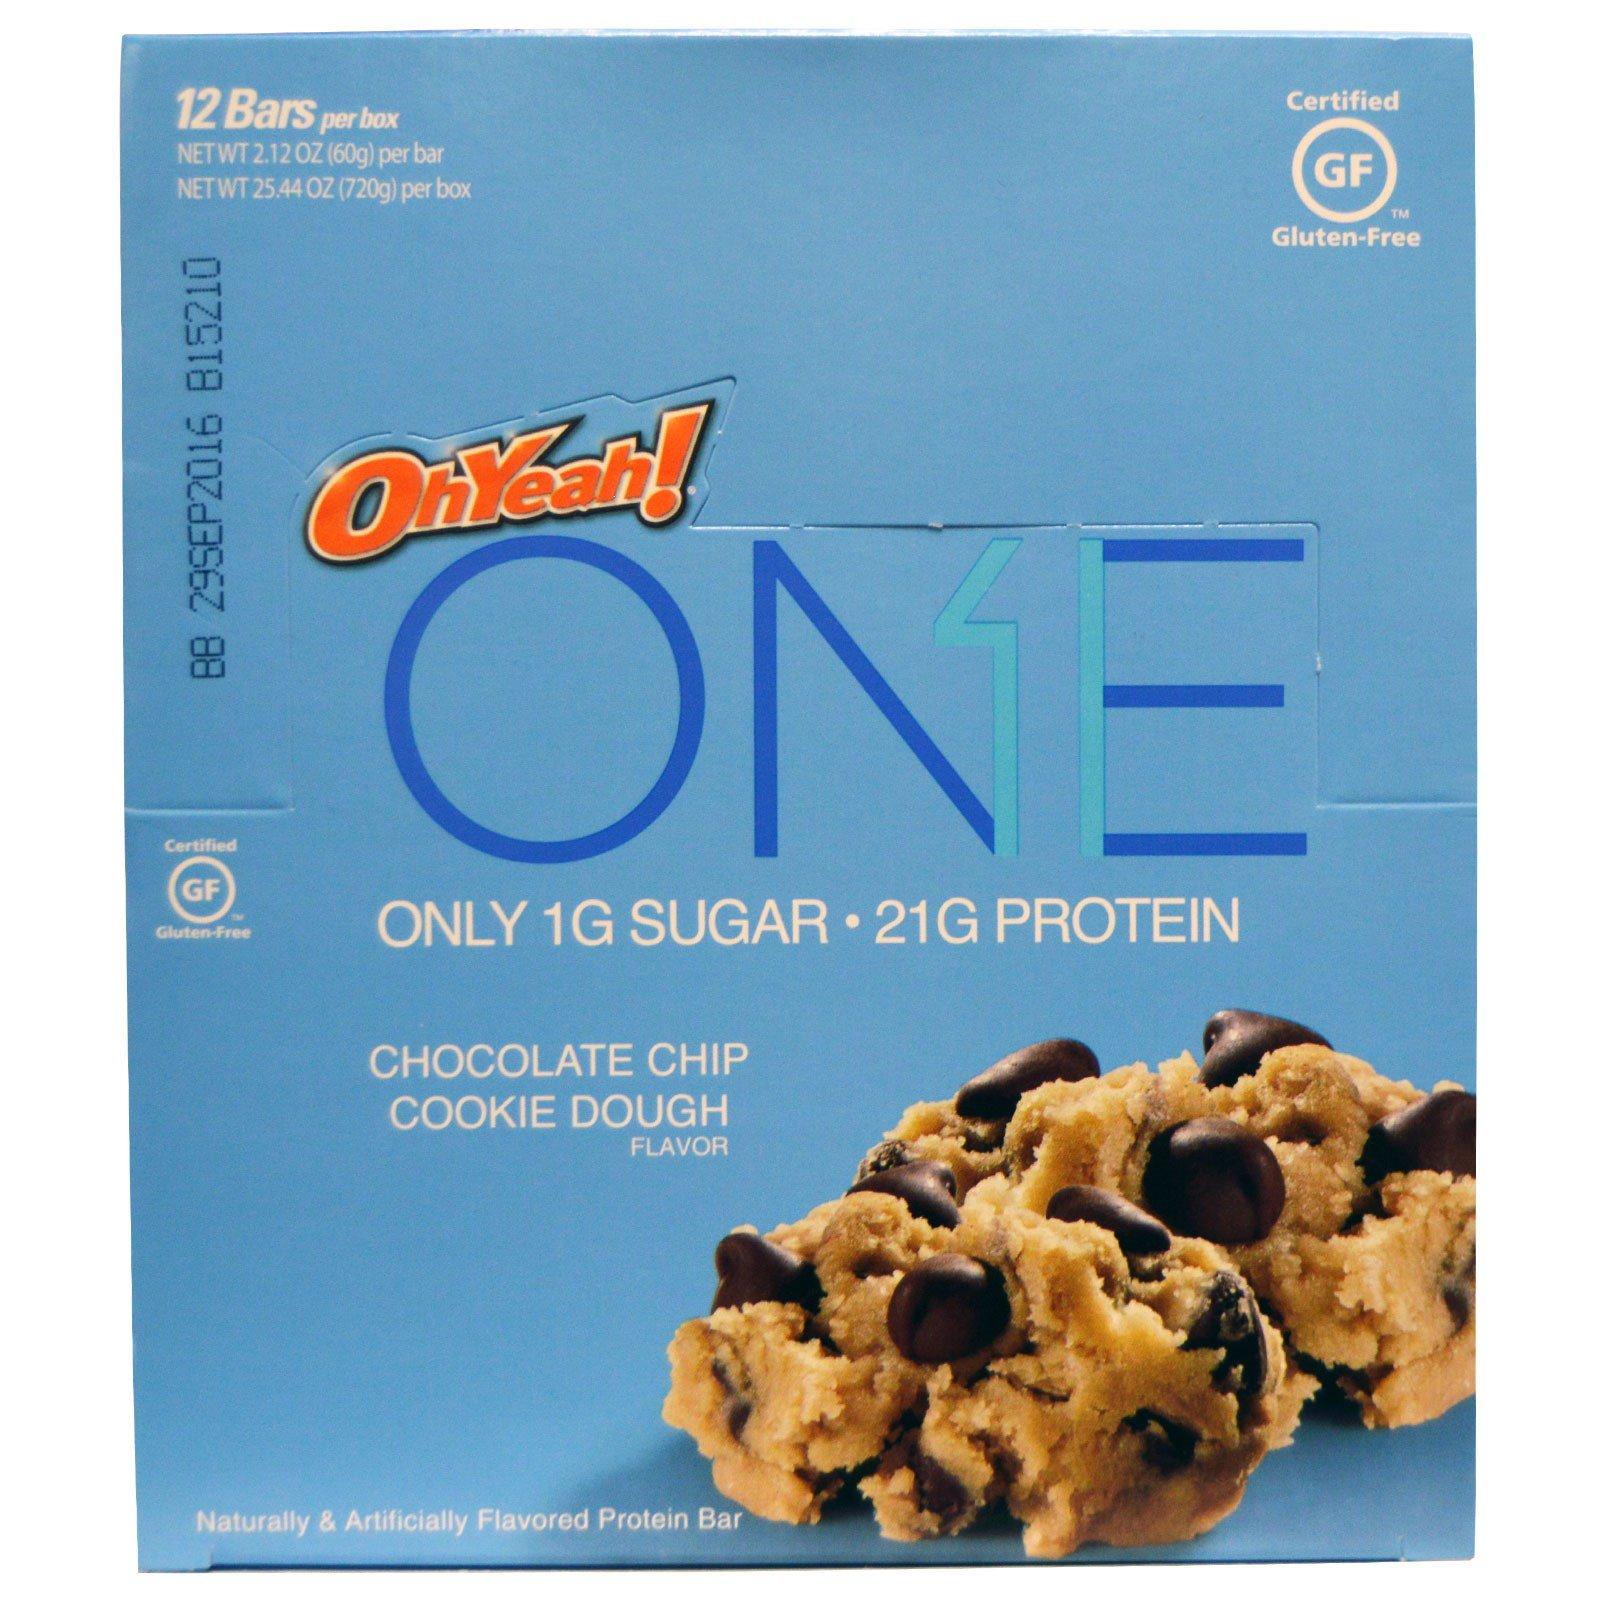 Oh Yeah!, One Bar, Chocolate Chip Cookie Dough Flavor, 12 Bars, 2.12 oz (60 g) Each